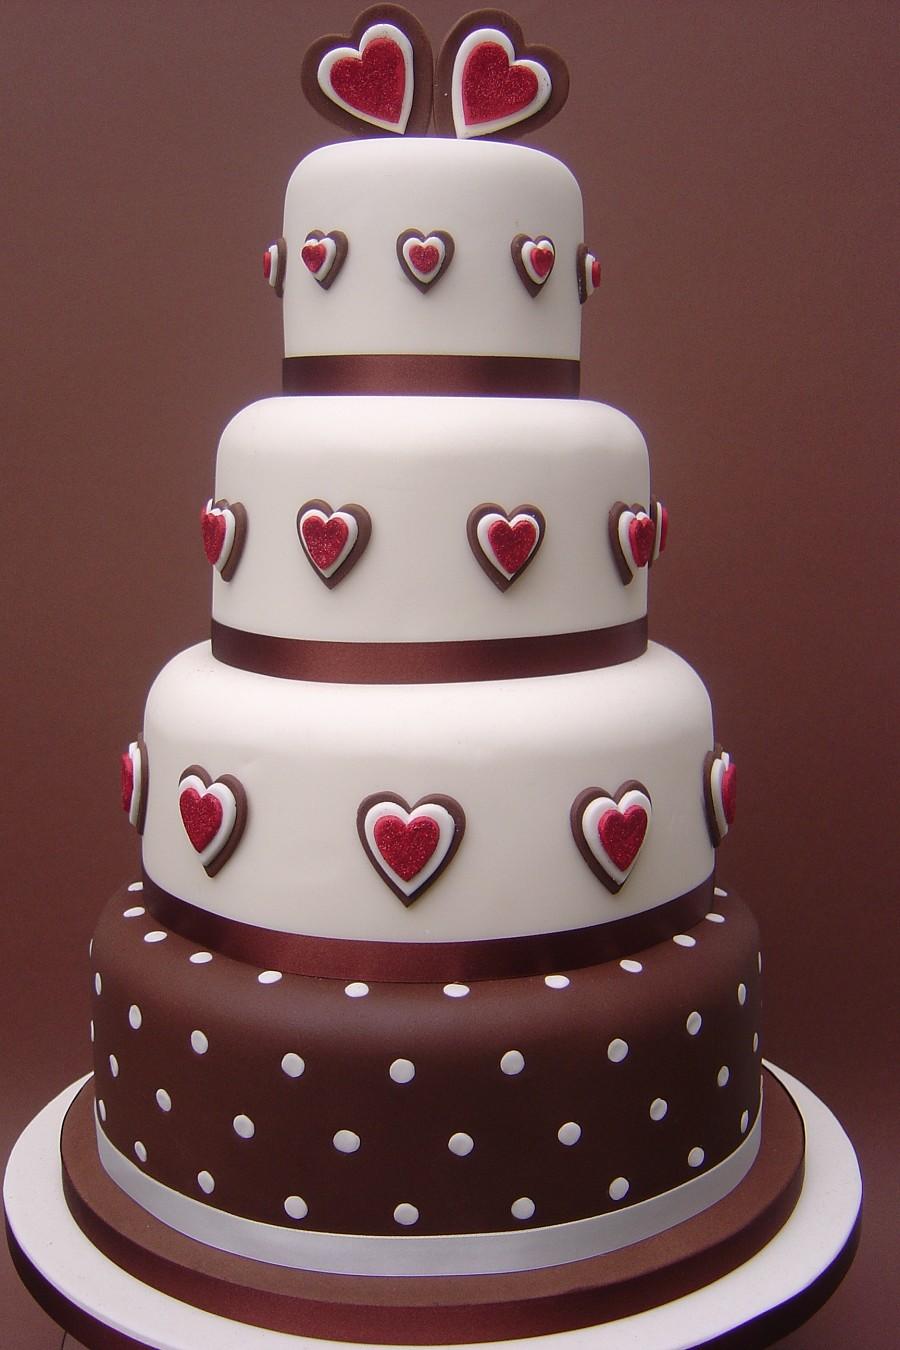 10 Engagement Cakes Ideas Designs Photo - Valentine Wedding Cake ...